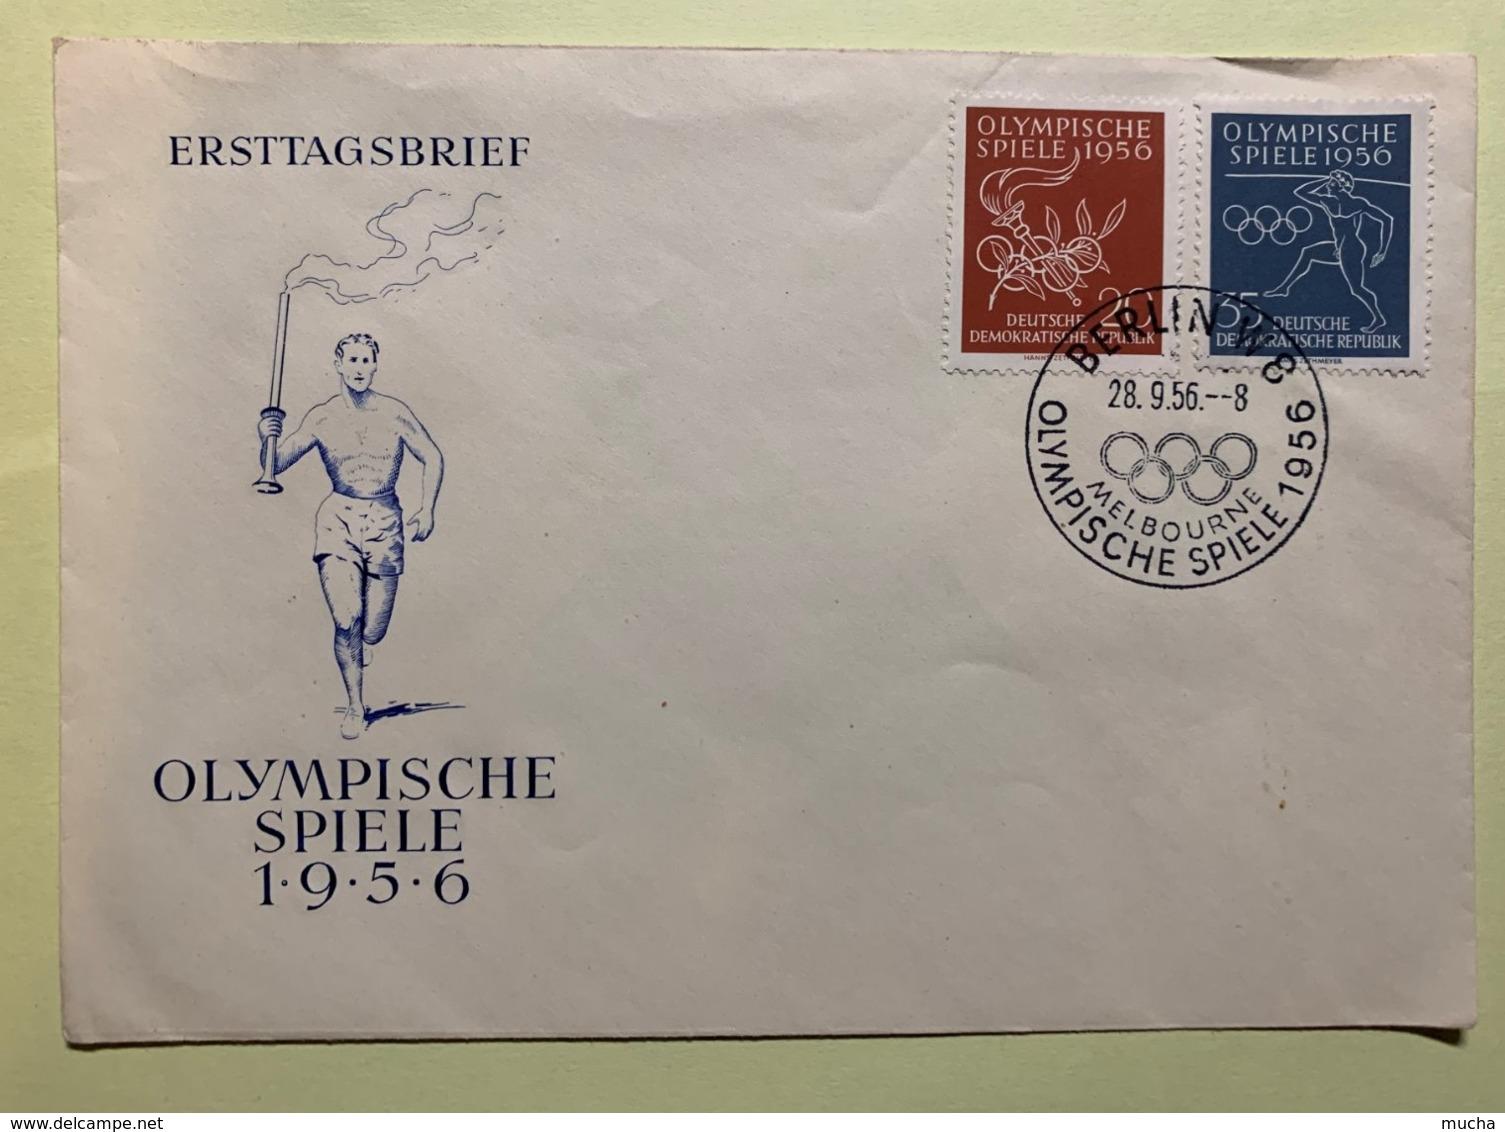 9094 -  DDR Olympische Spiele 1956 Melbourne Berlin 28.09.1956 - Sommer 1956: Melbourne